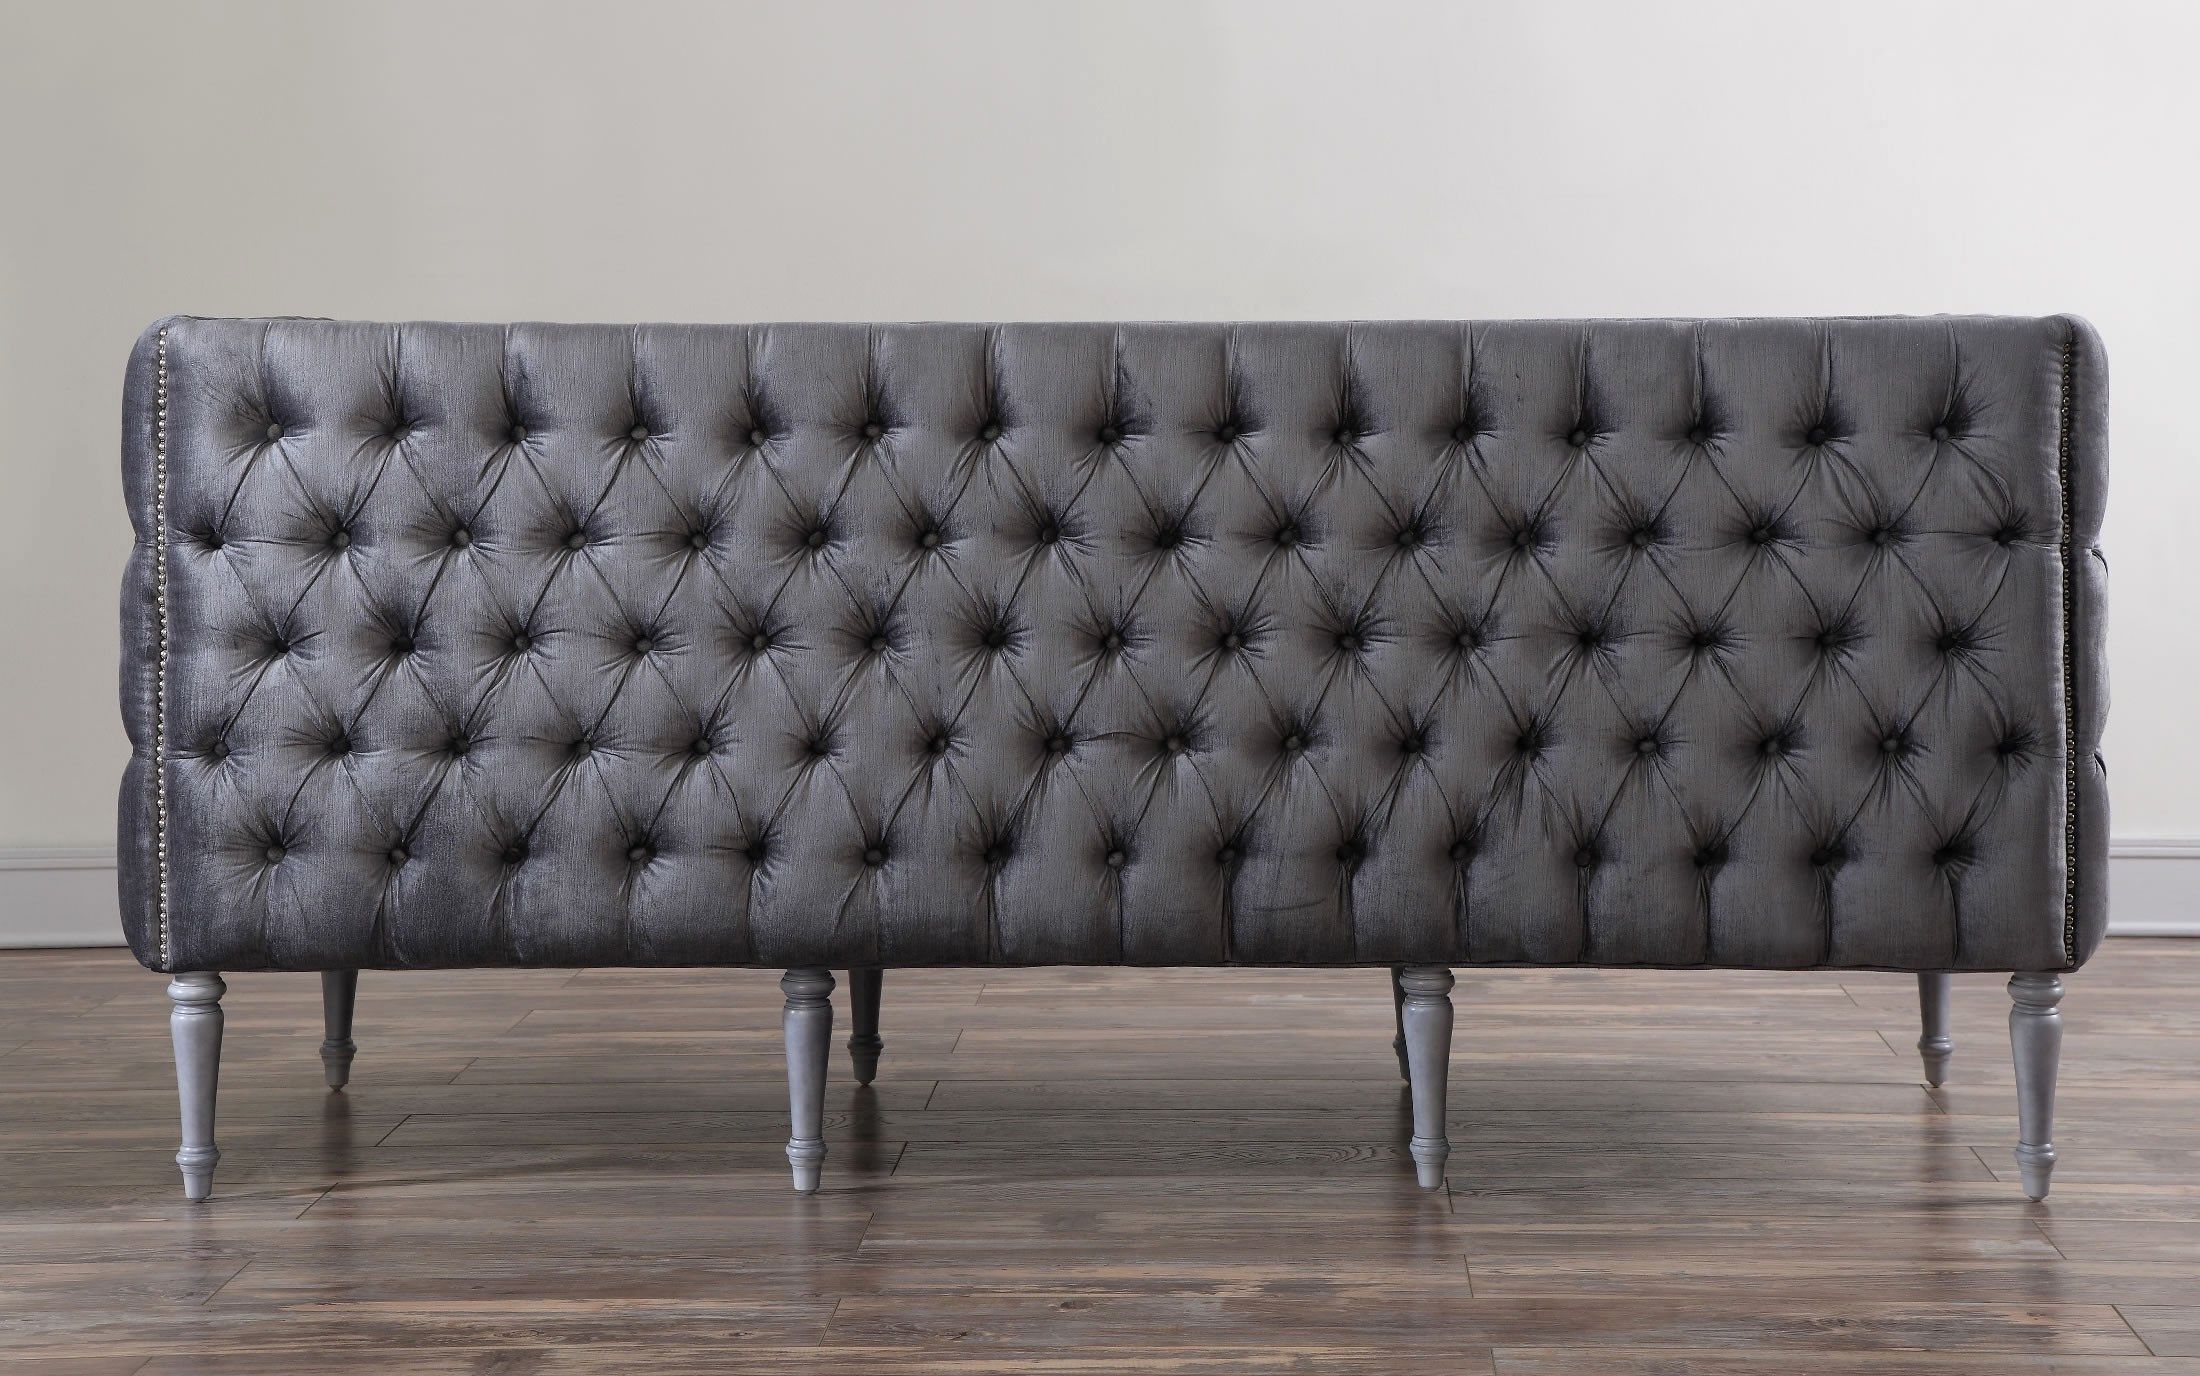 Charmant Beautiful Tufted Sofa Velvet Image Tufted Sofa Velvet Elegant Sofas Awesome Grey  Velvet Tufted Sofa White